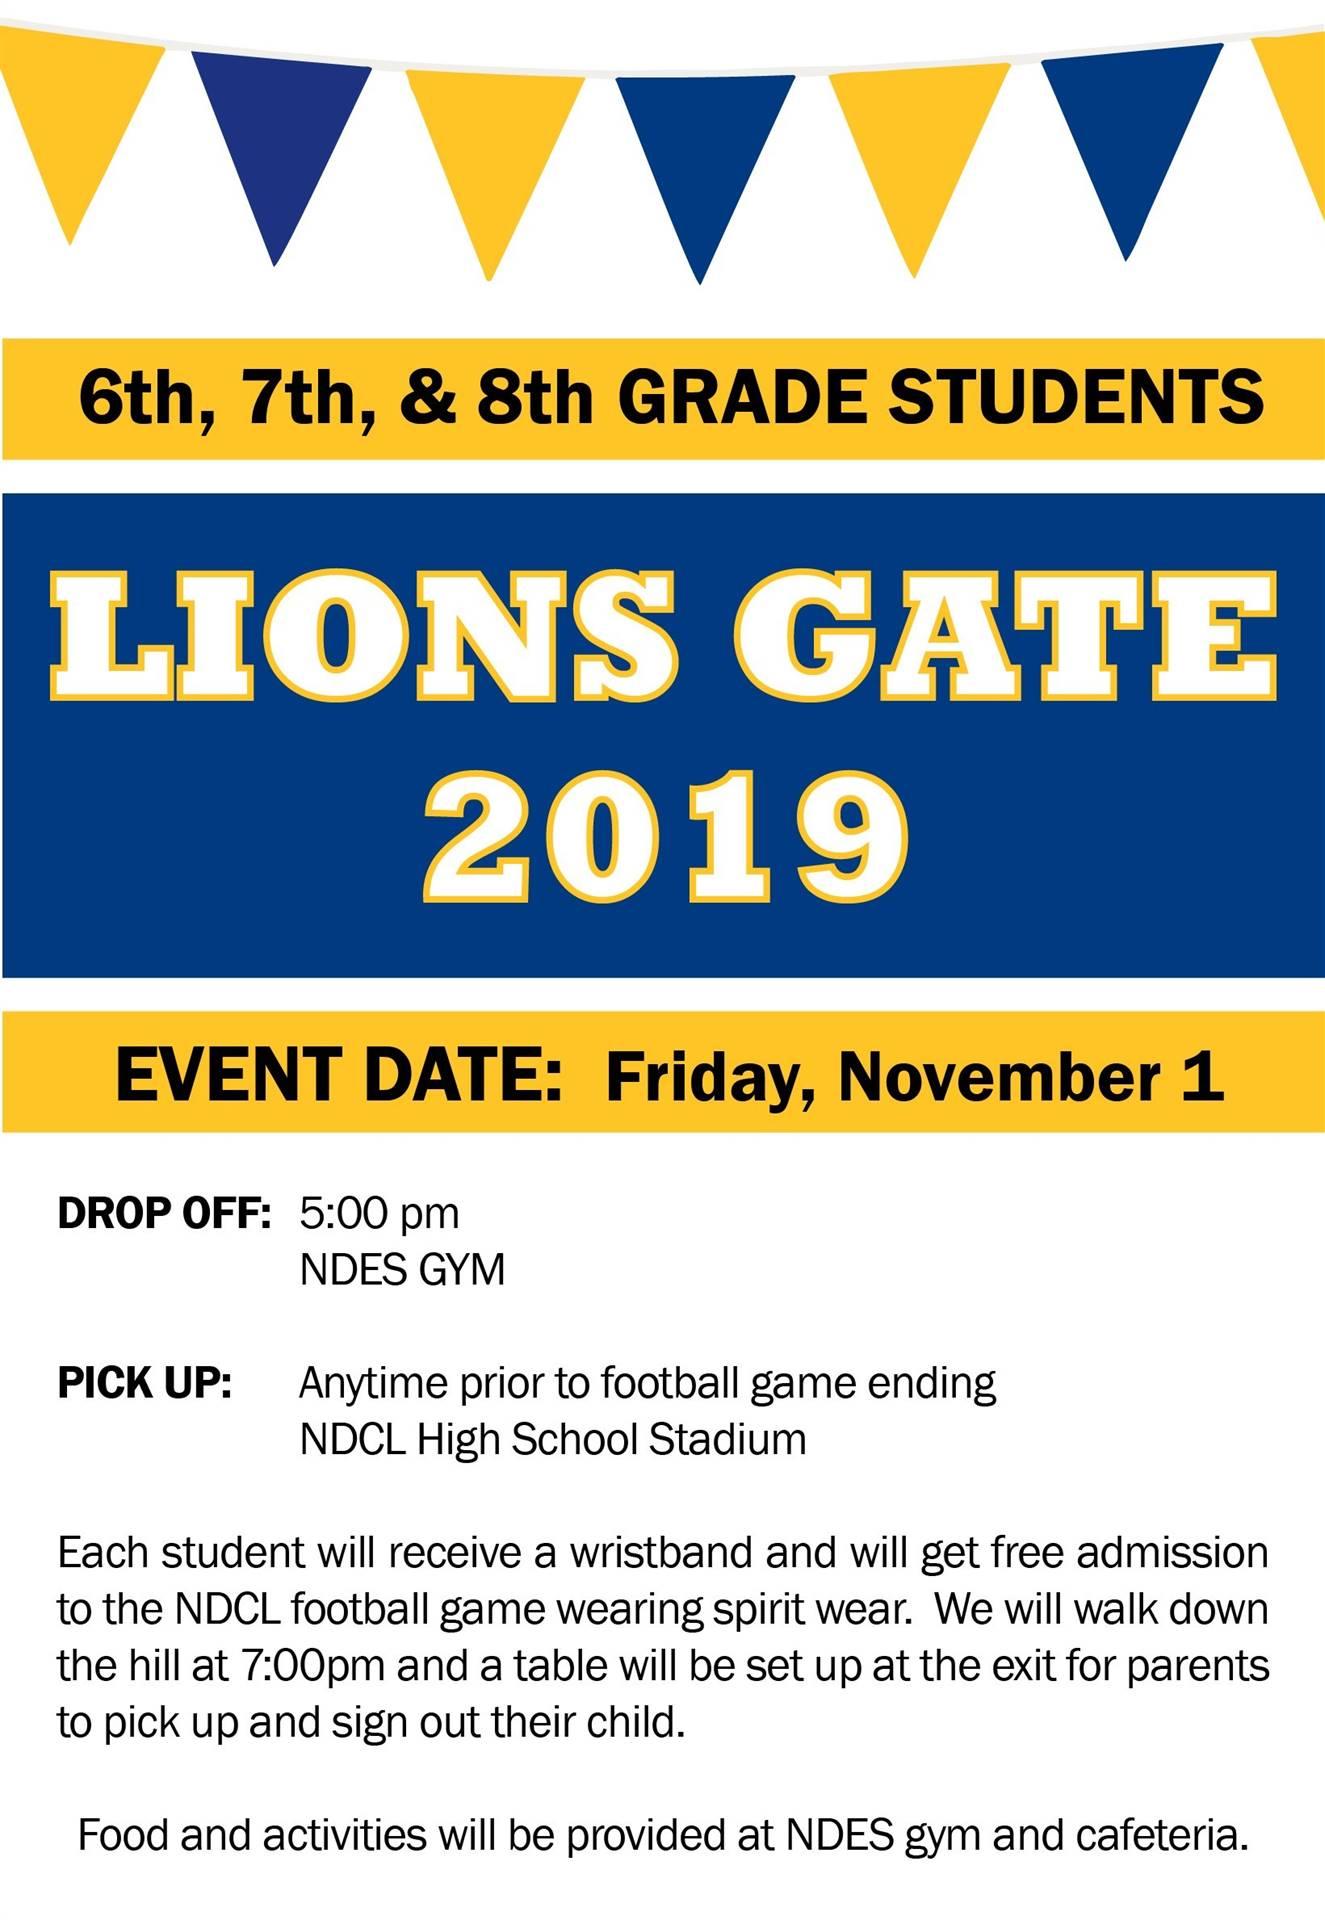 Lions Gate 2019